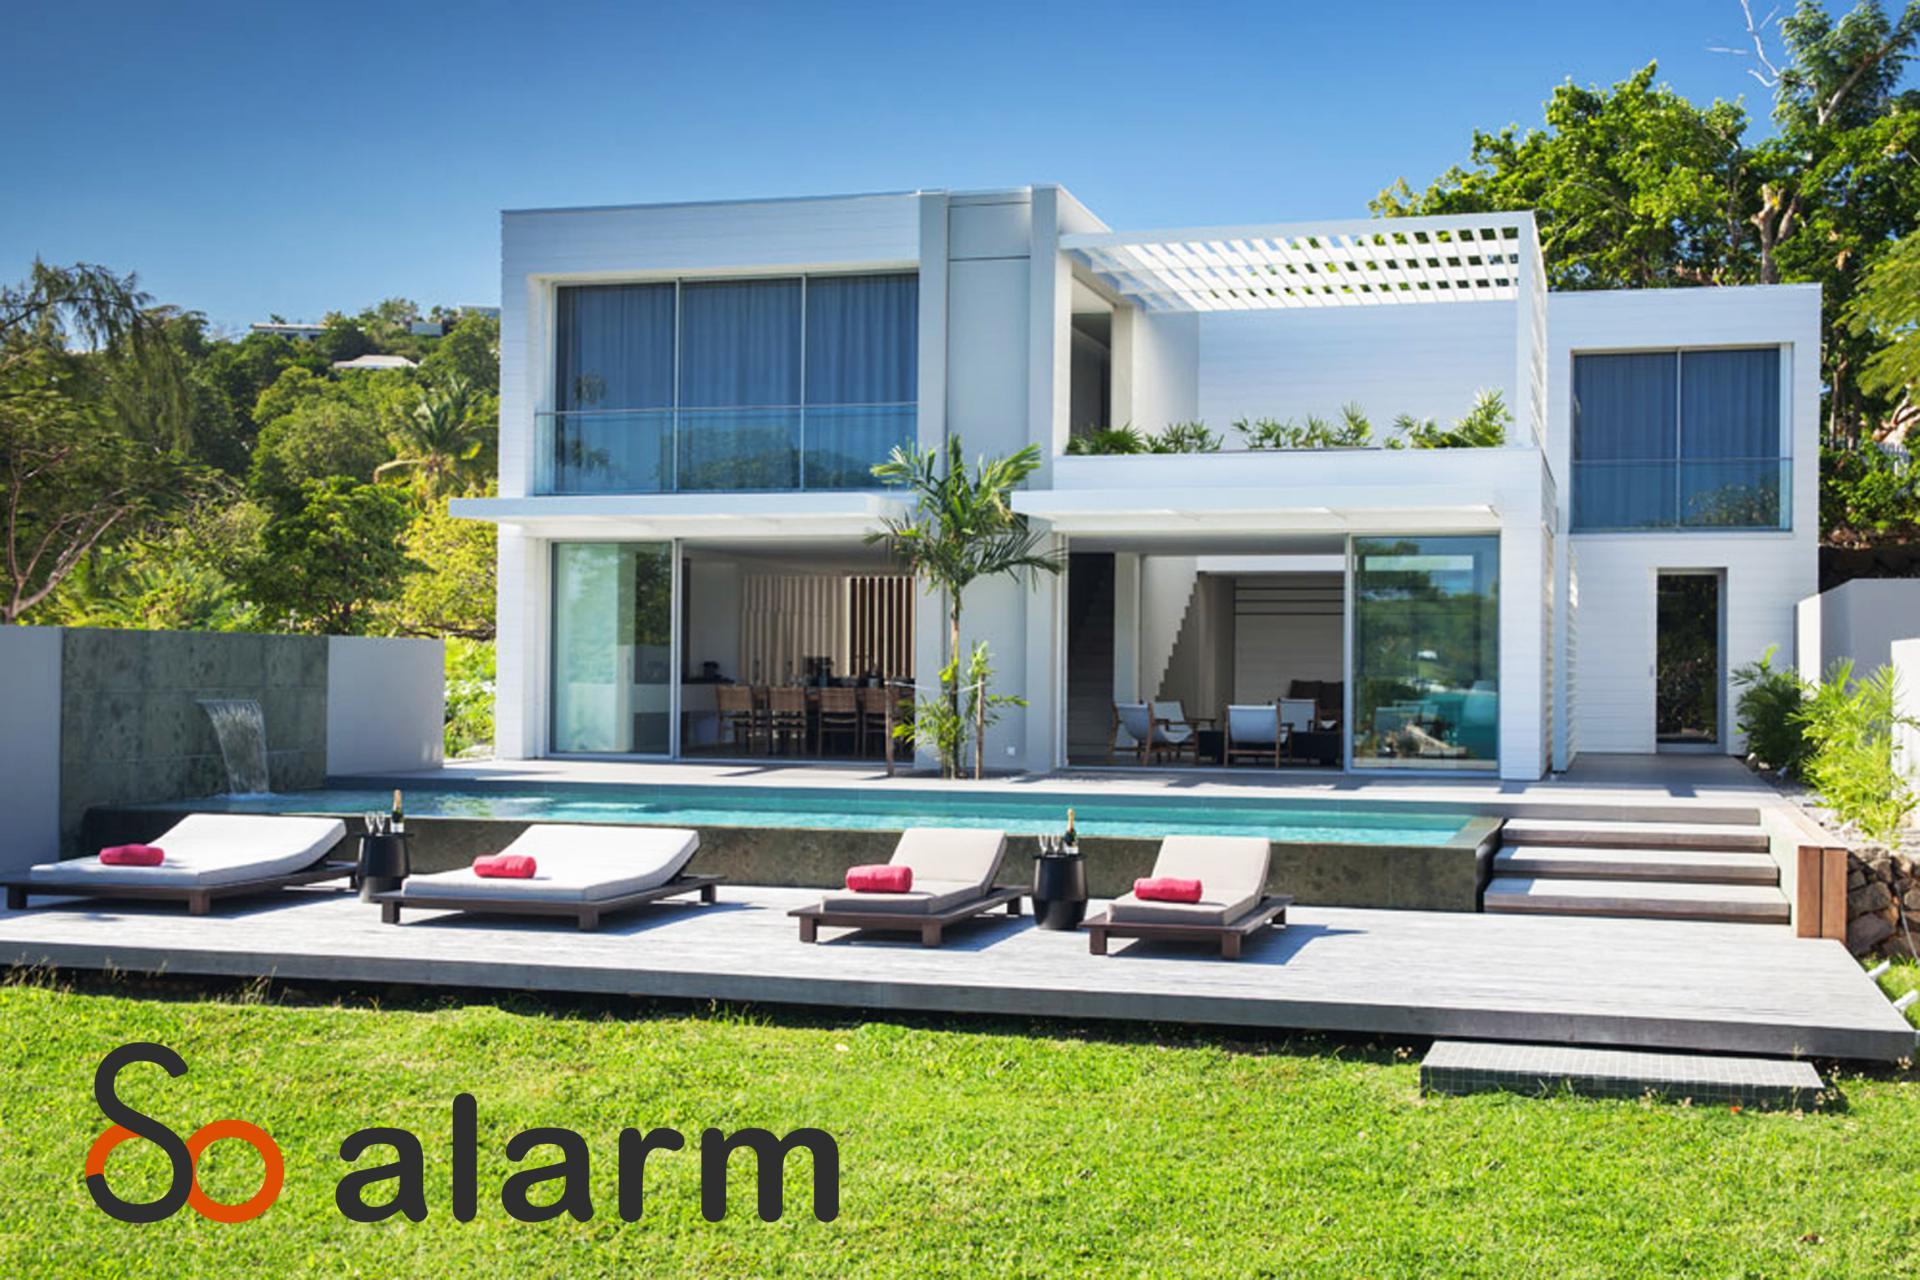 maison so alarm logo